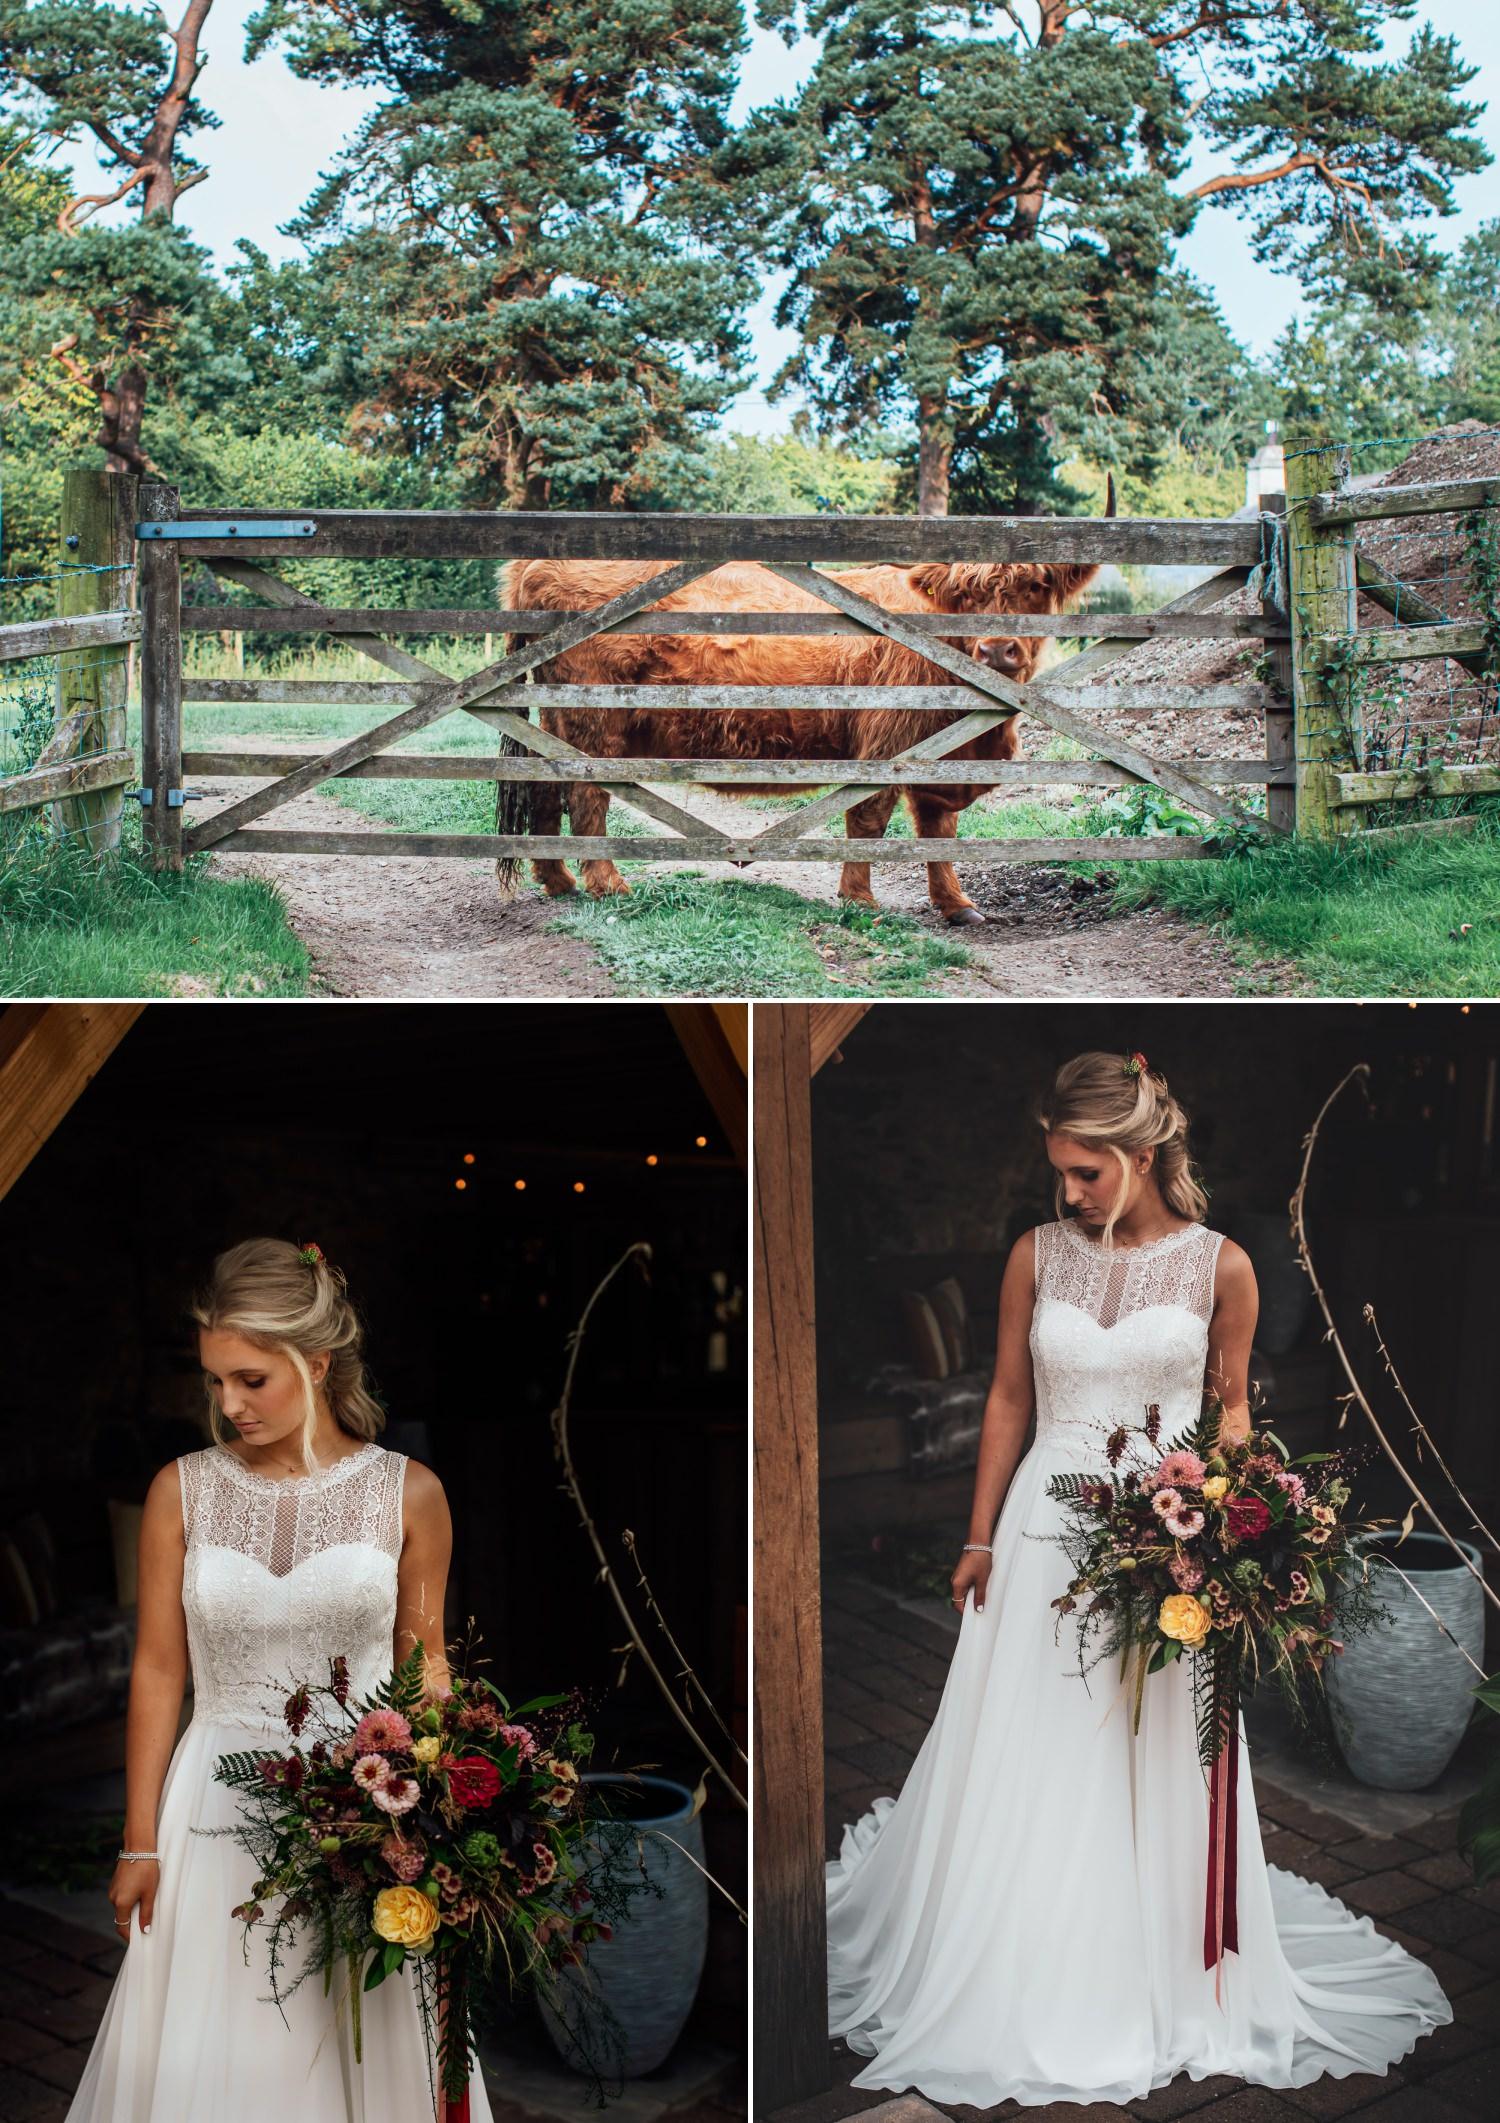 wedding photography of highland cow and brides wedding dress